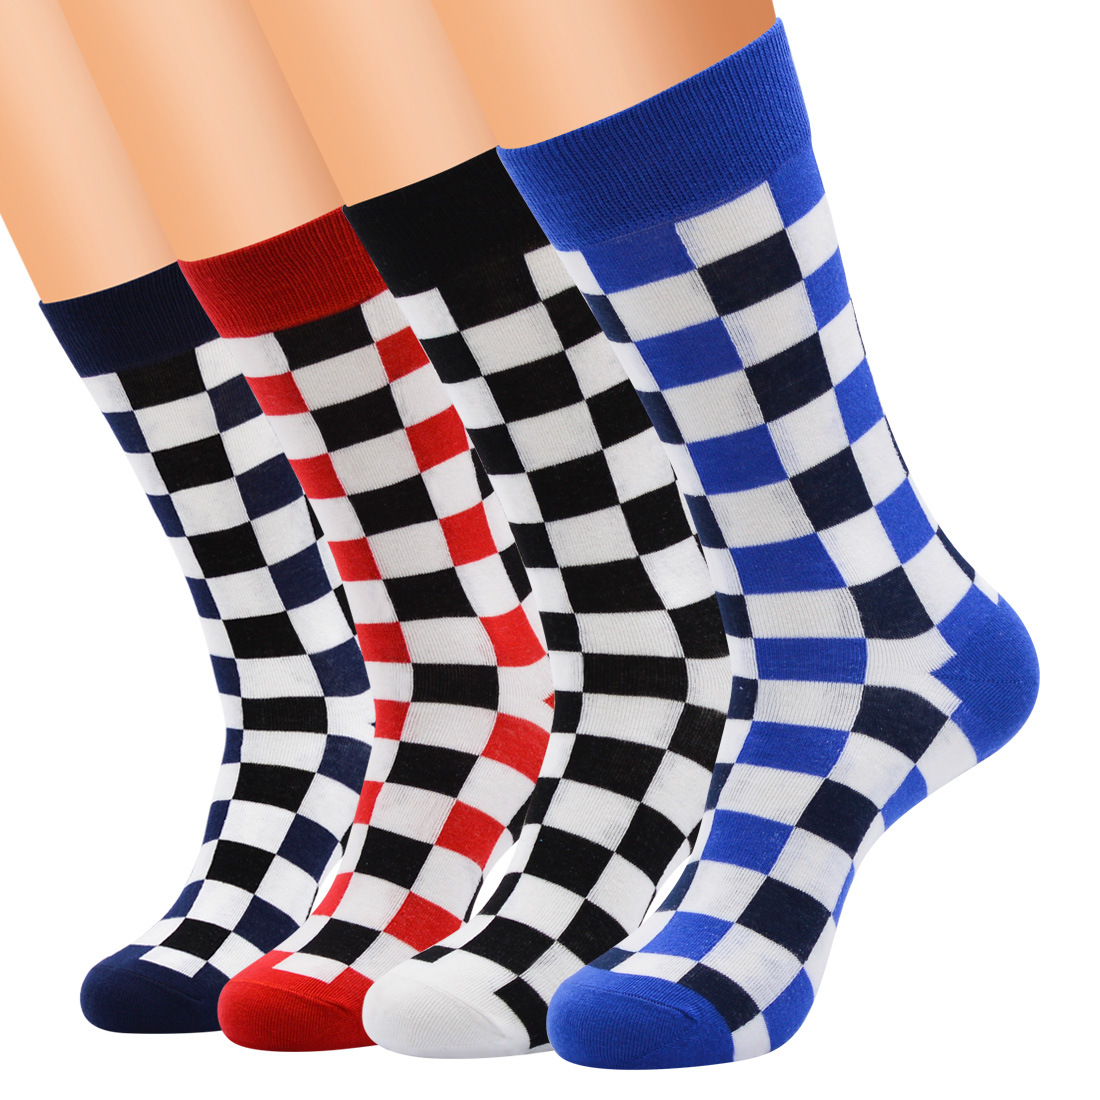 Korea Fashion Harajuku Trends Male Checkerboard Socks Style Geometric Checkered Socks Men Hip Hop Cotton Unisex Soks